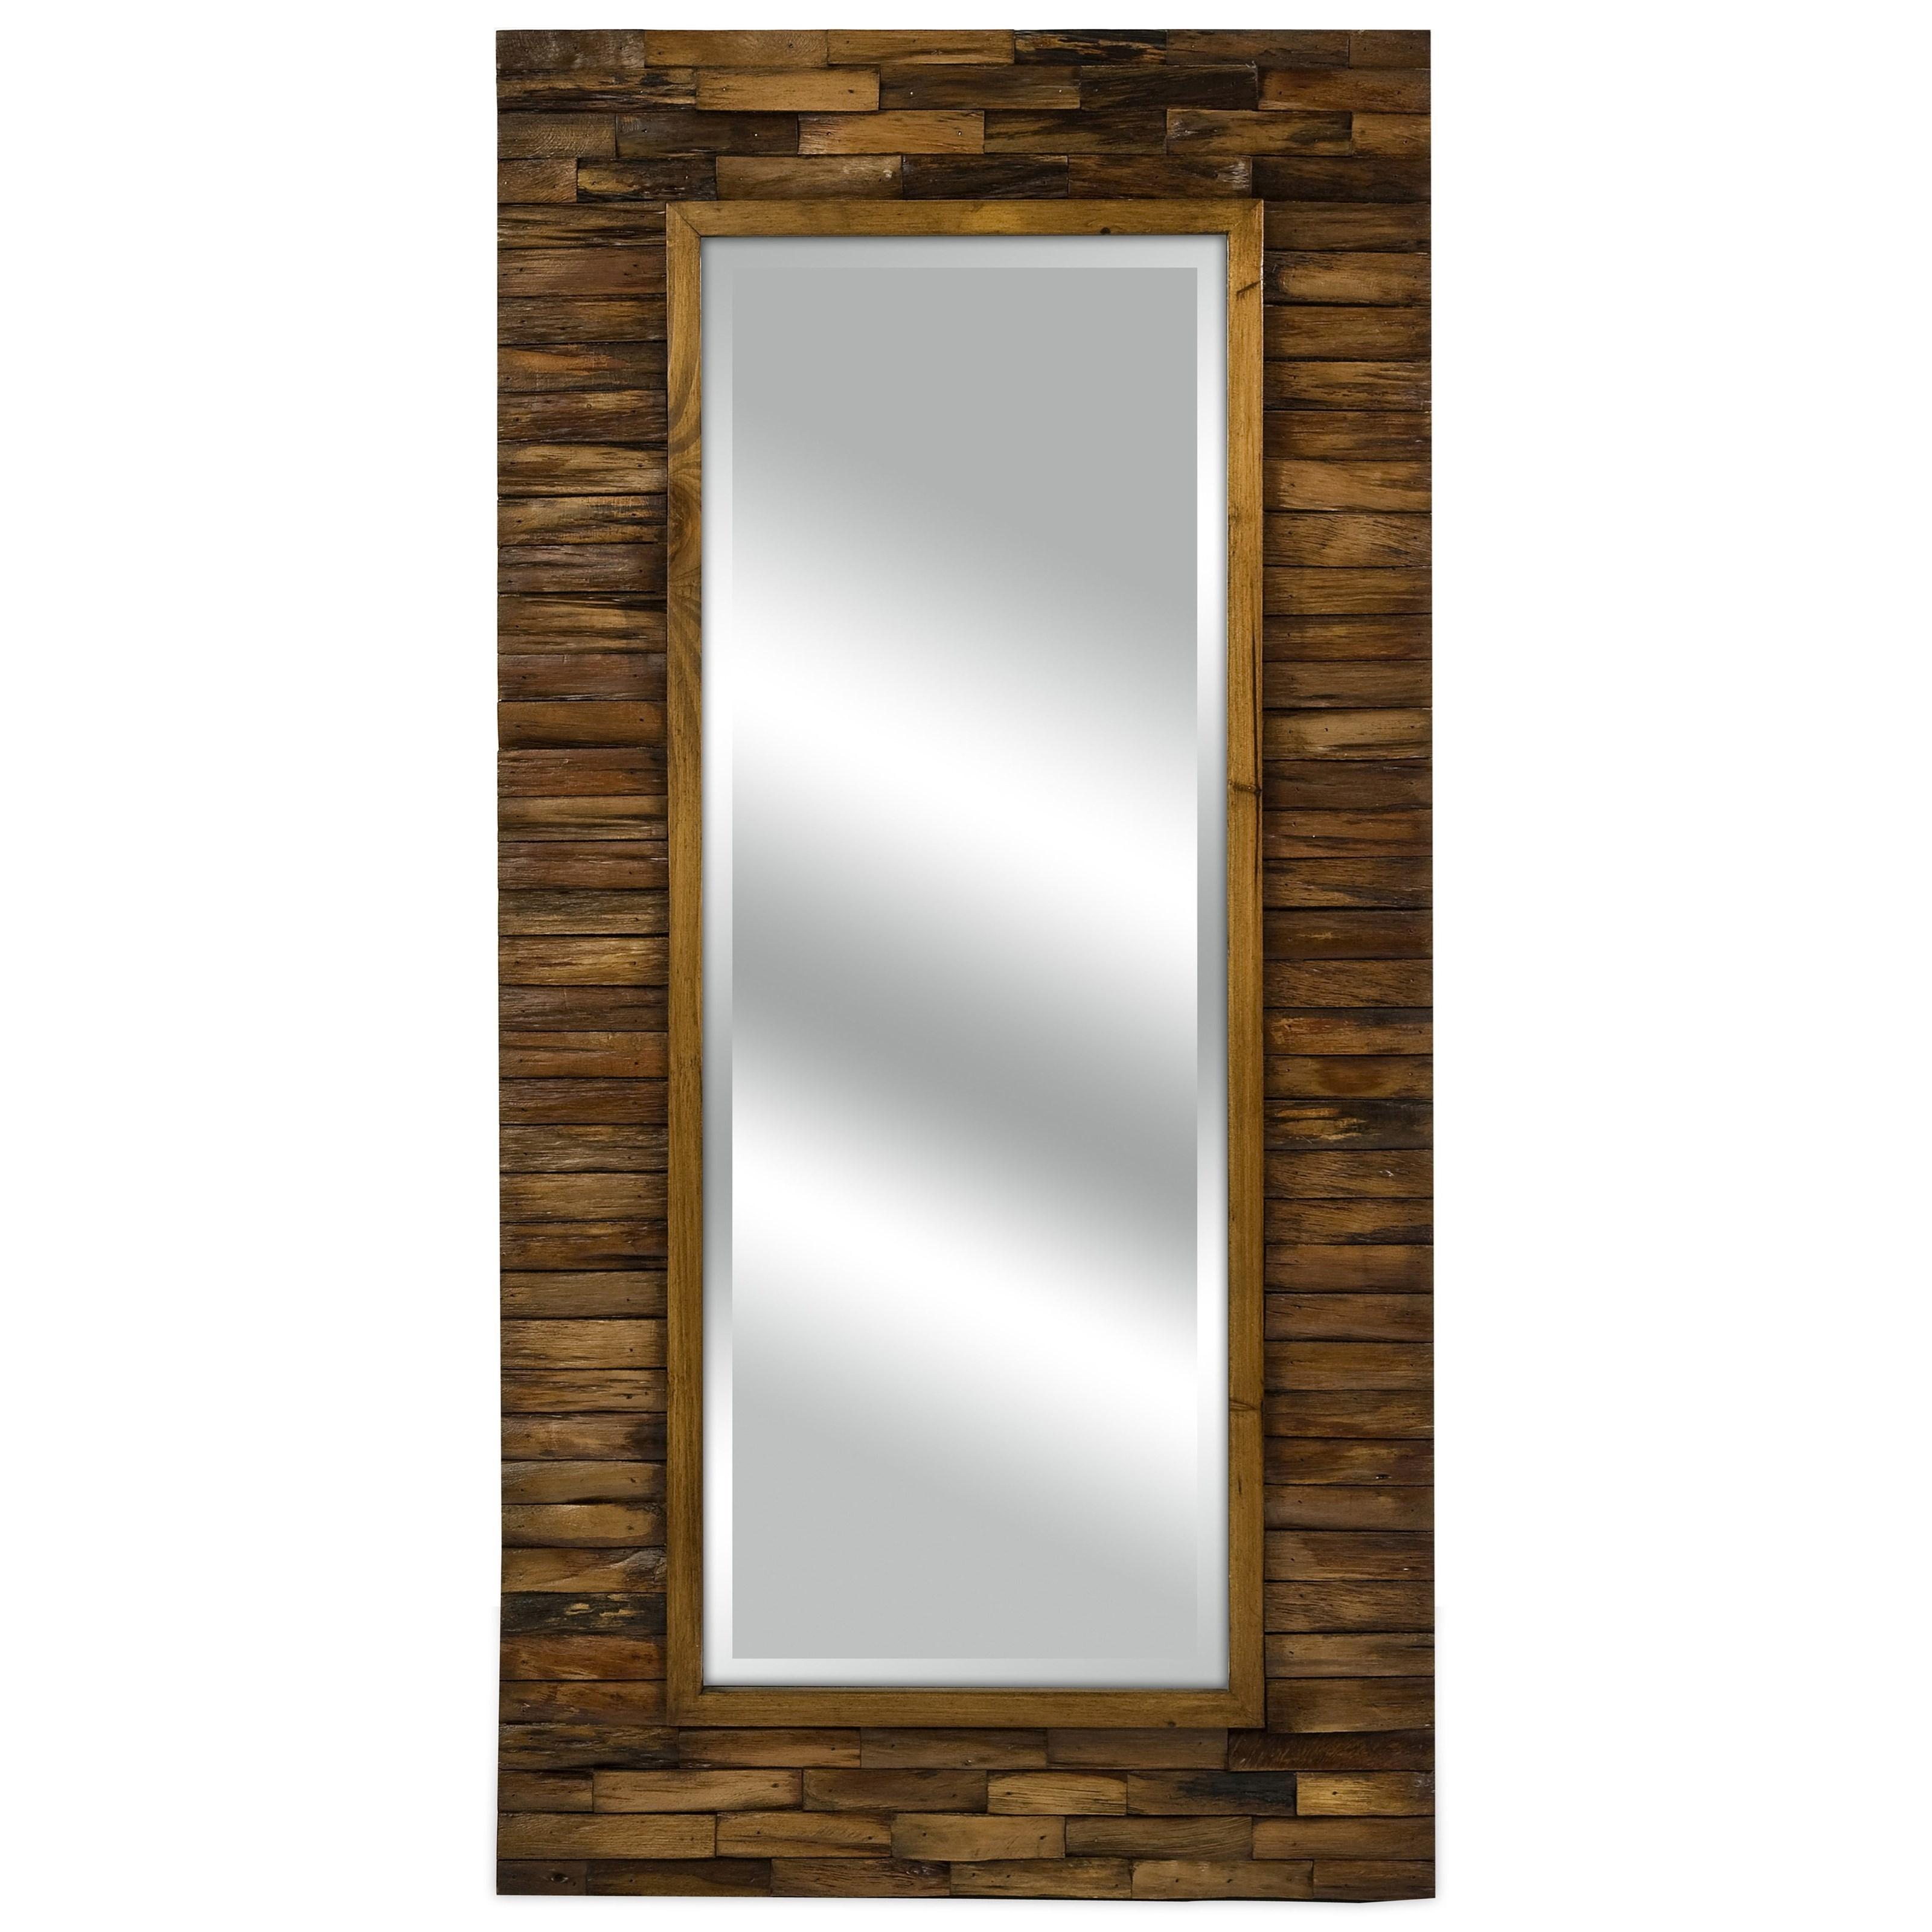 Imax 63403 Baker Aluminum Clad Mirror